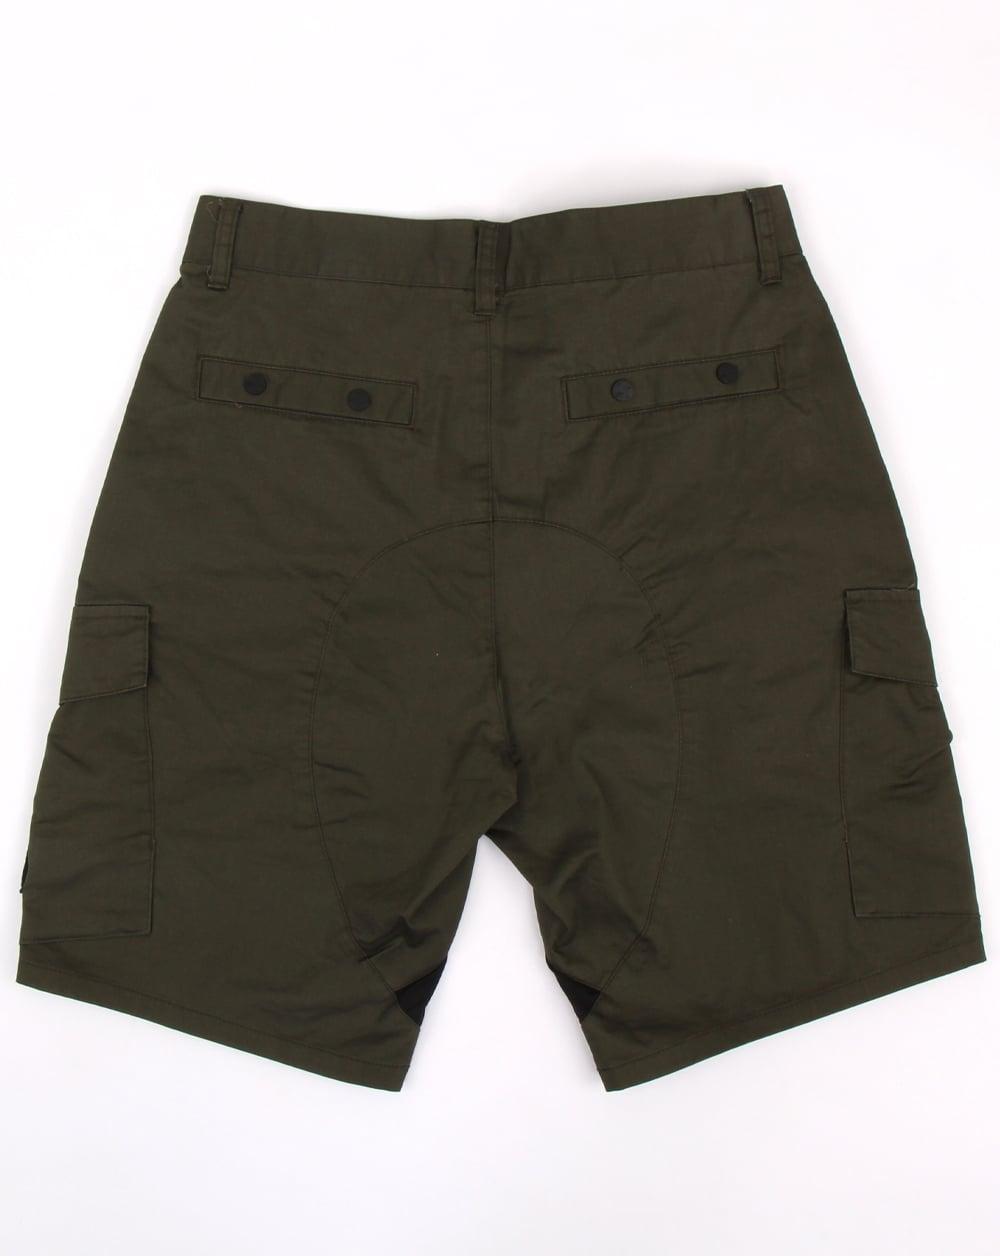 71369019ff Marshall Artist Siren Combat Shorts Khaki, Men's, Cargo